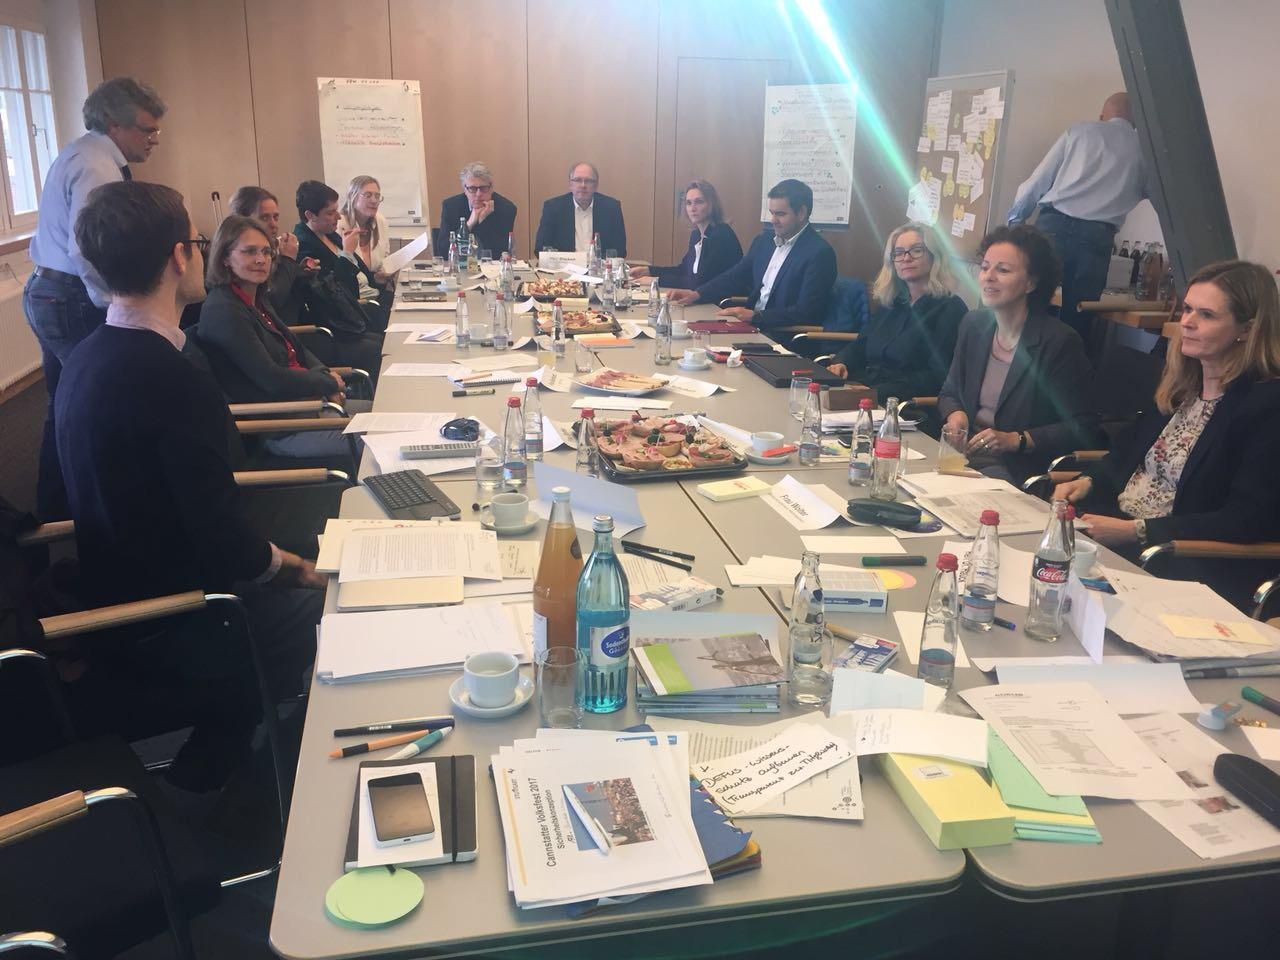 Stuttgart Lunch debate